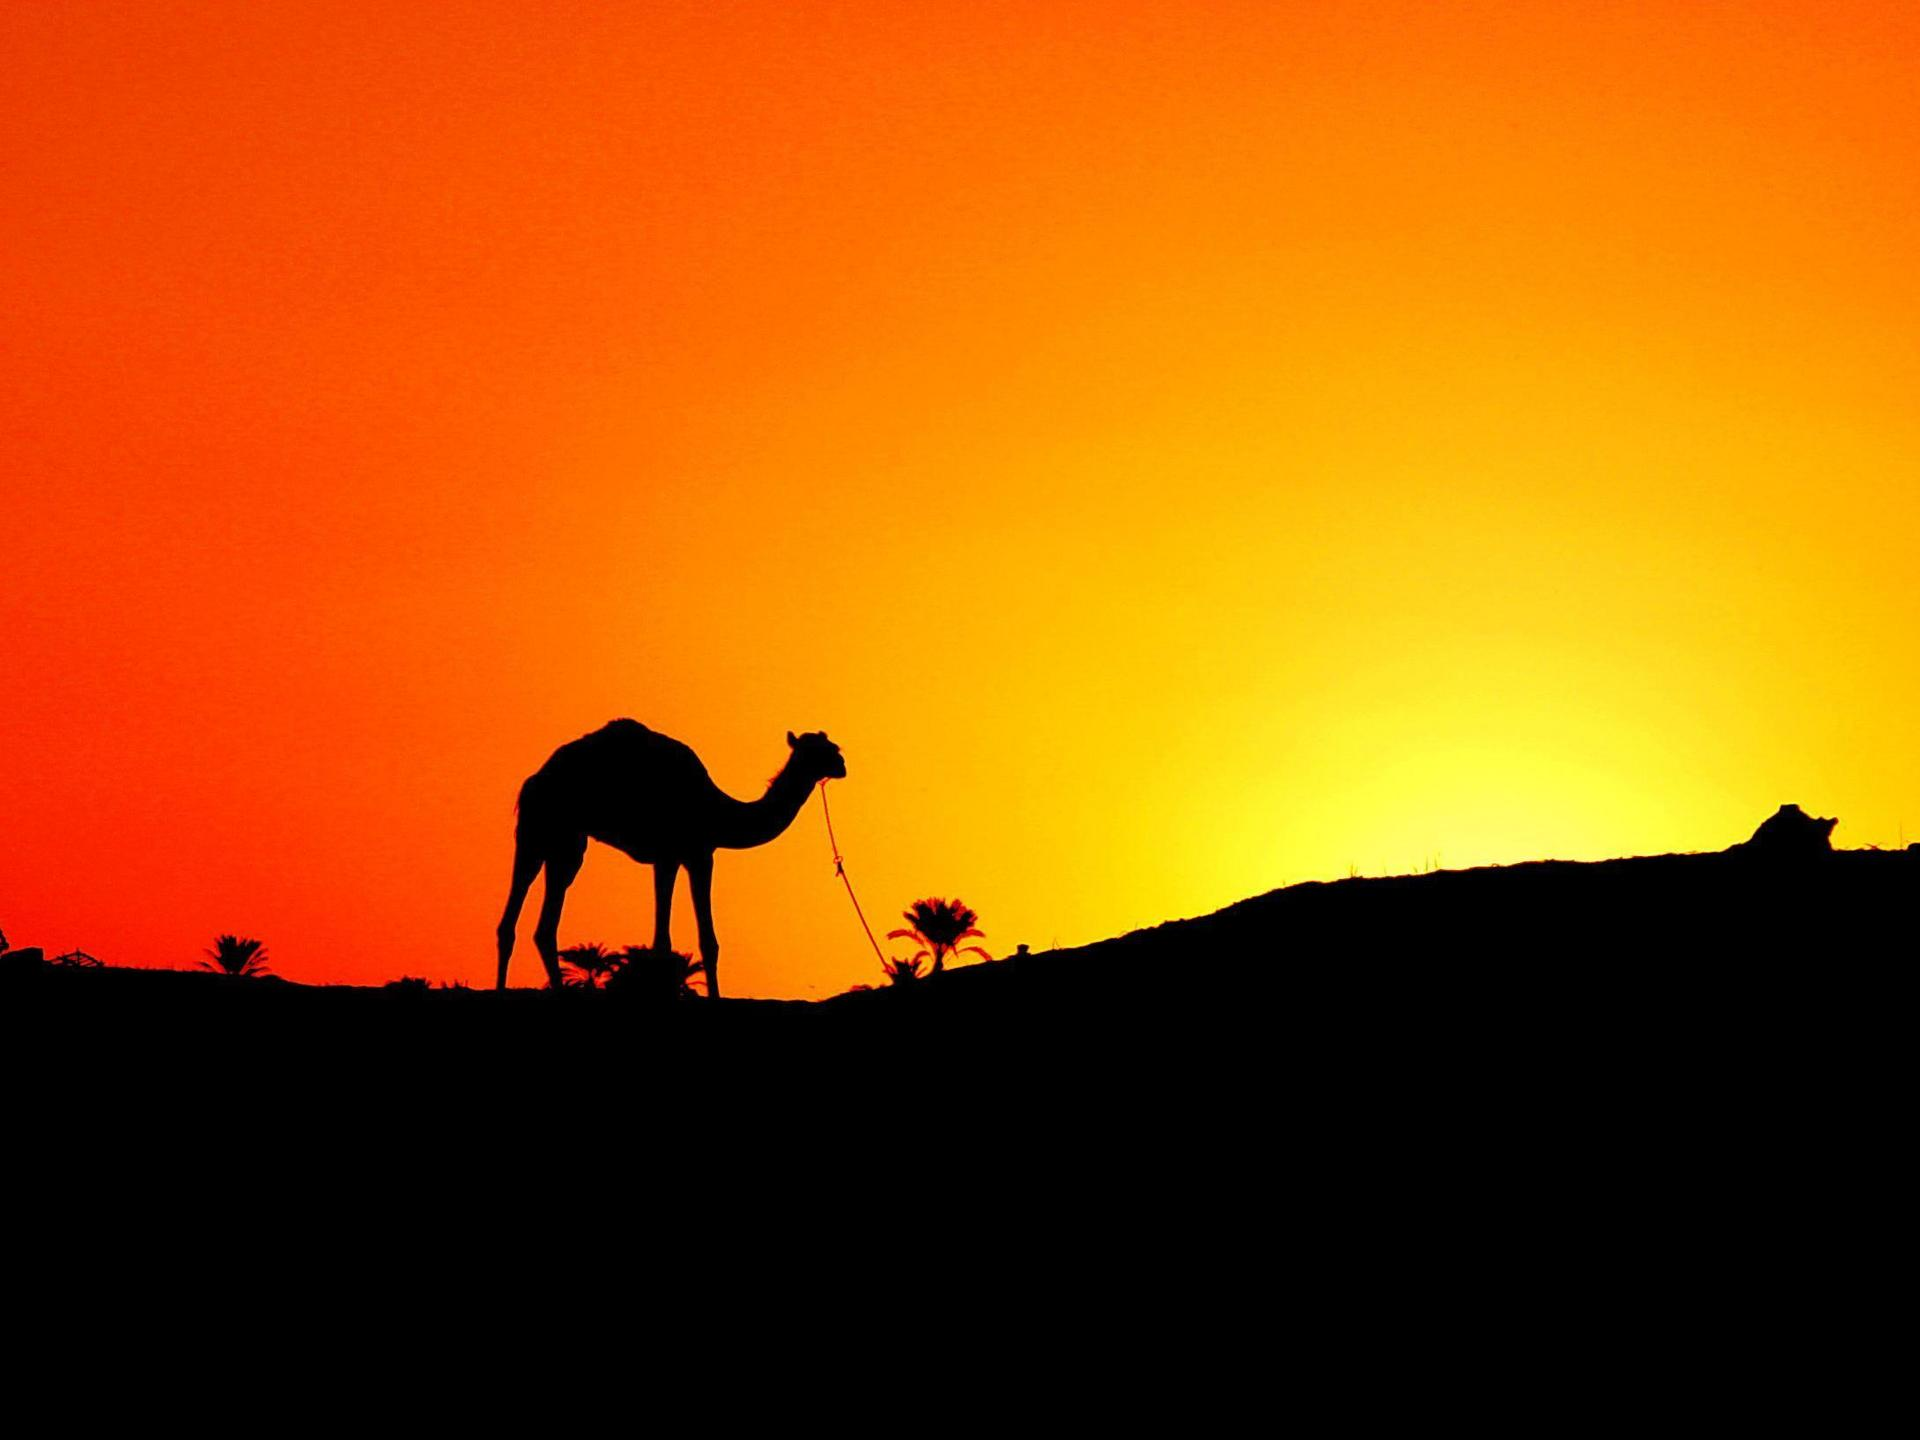 Camel In The Sunset Egypt Wallpaper 1240440 Fanpop